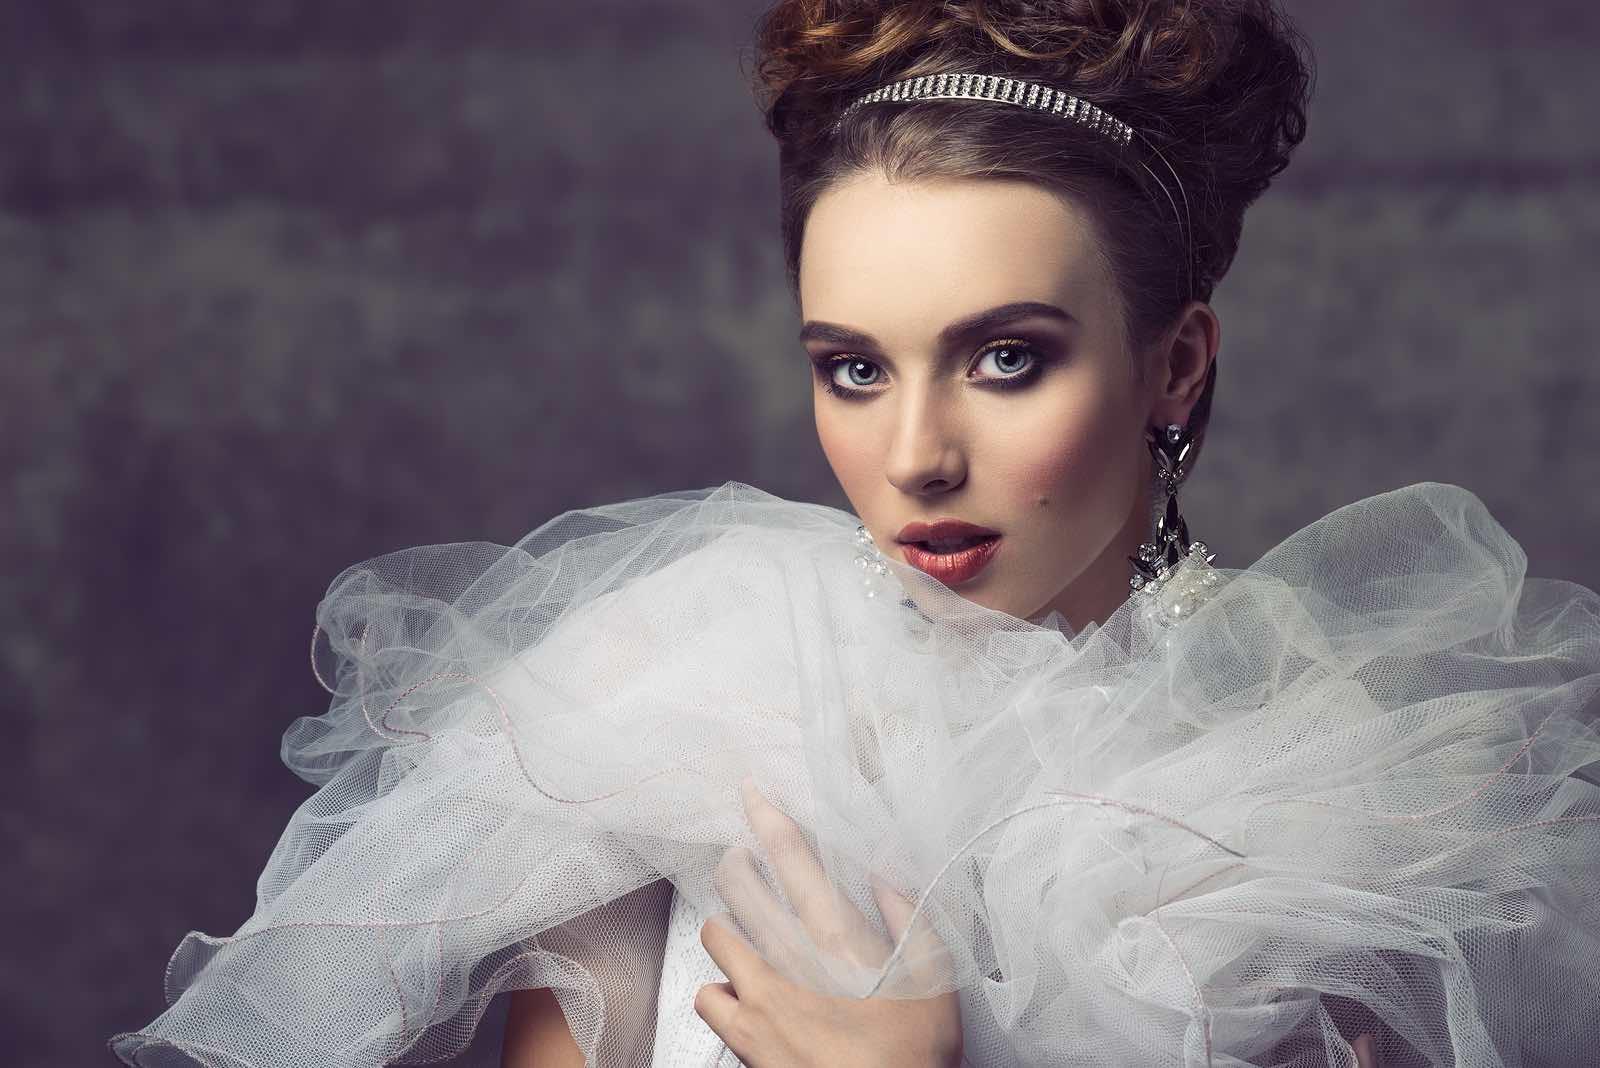 Charming Aristocratic Vintage Woman